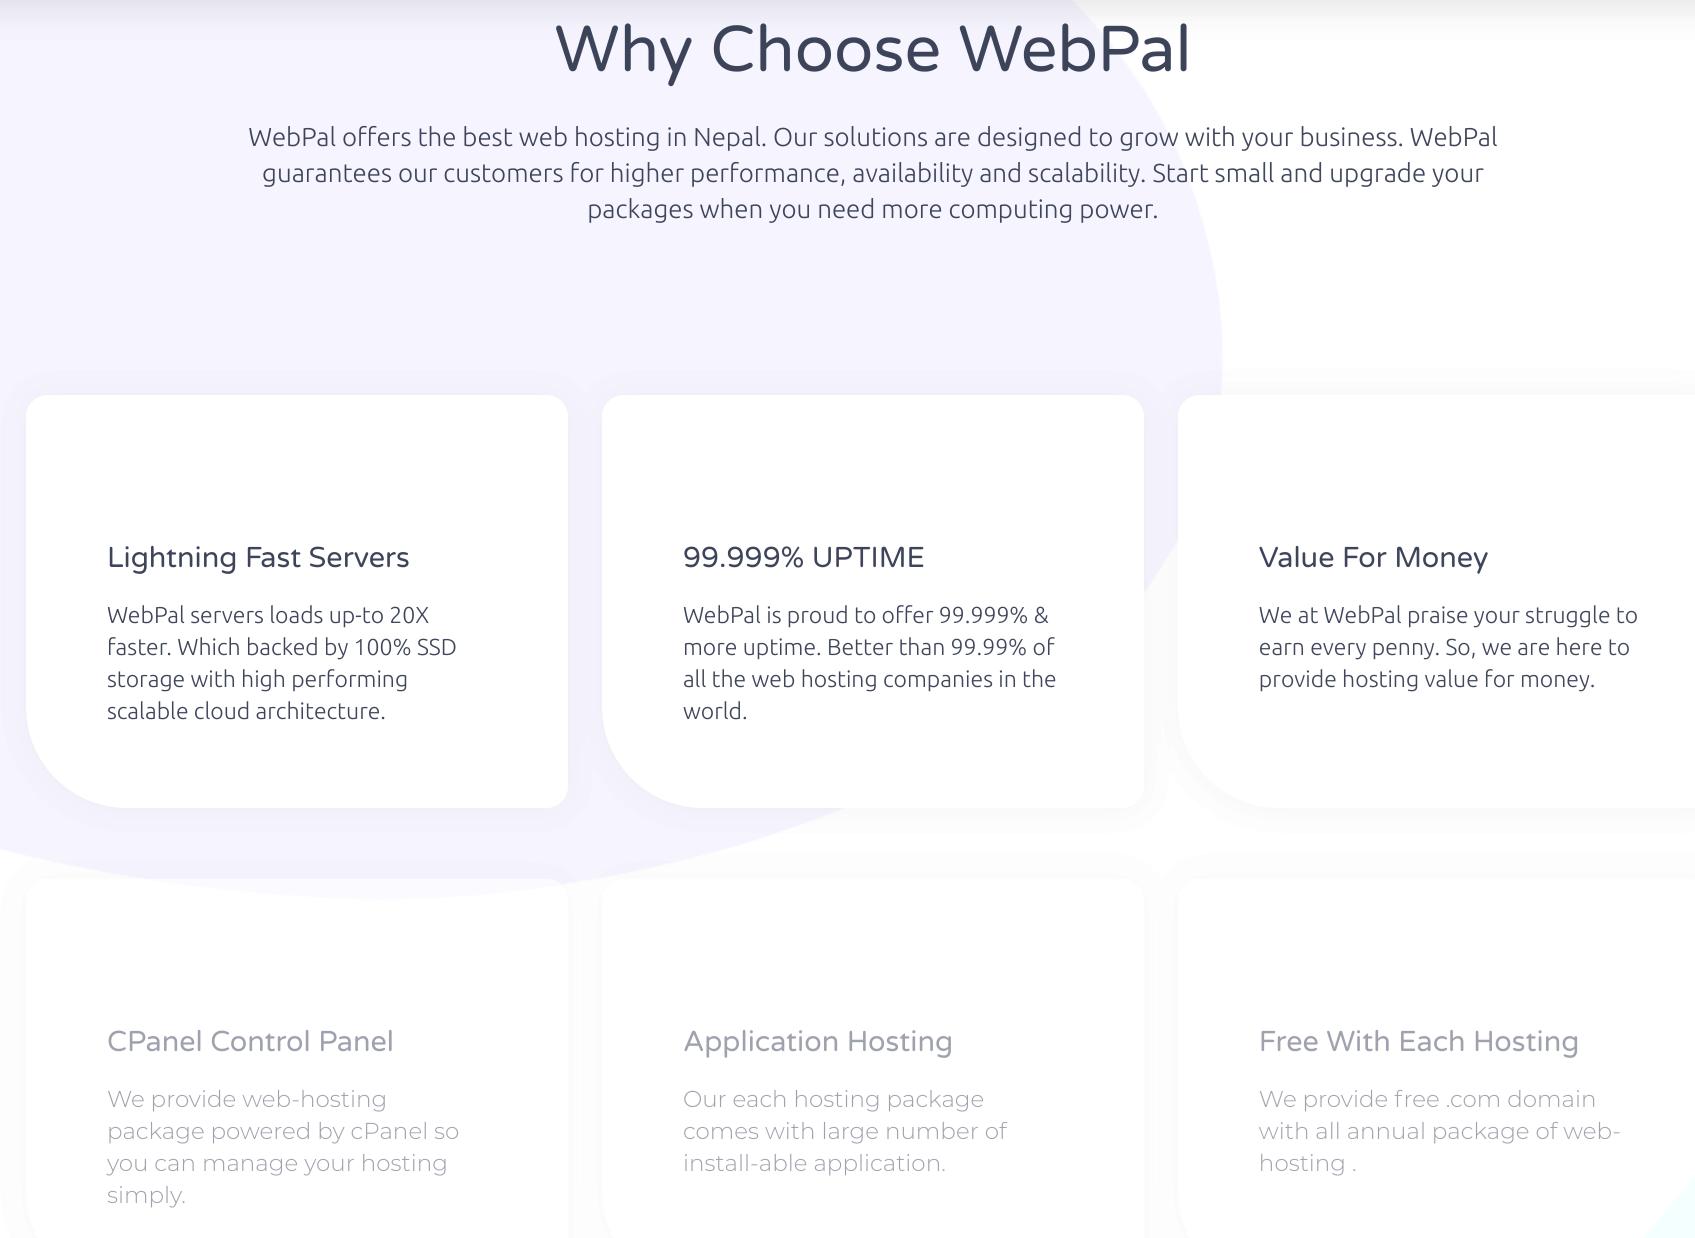 WebPal